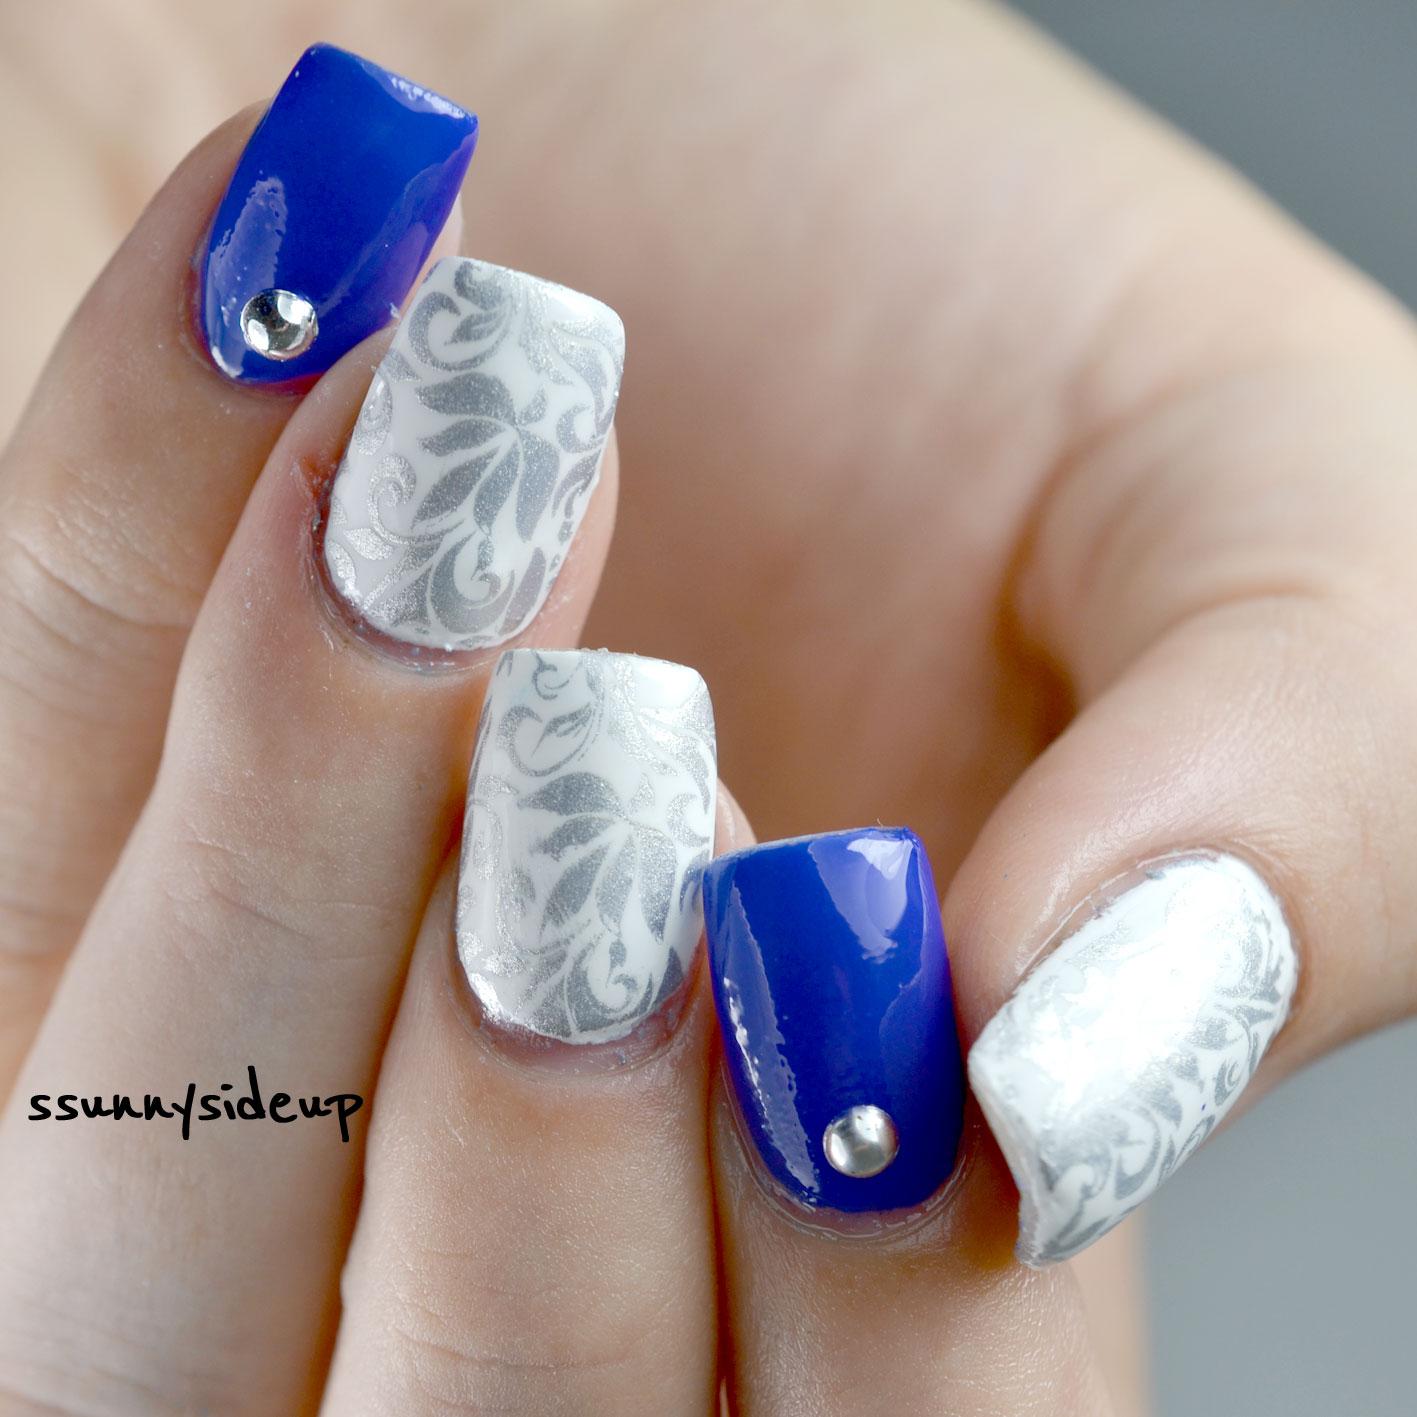 ssunnysideup elegant blue white and silver nails